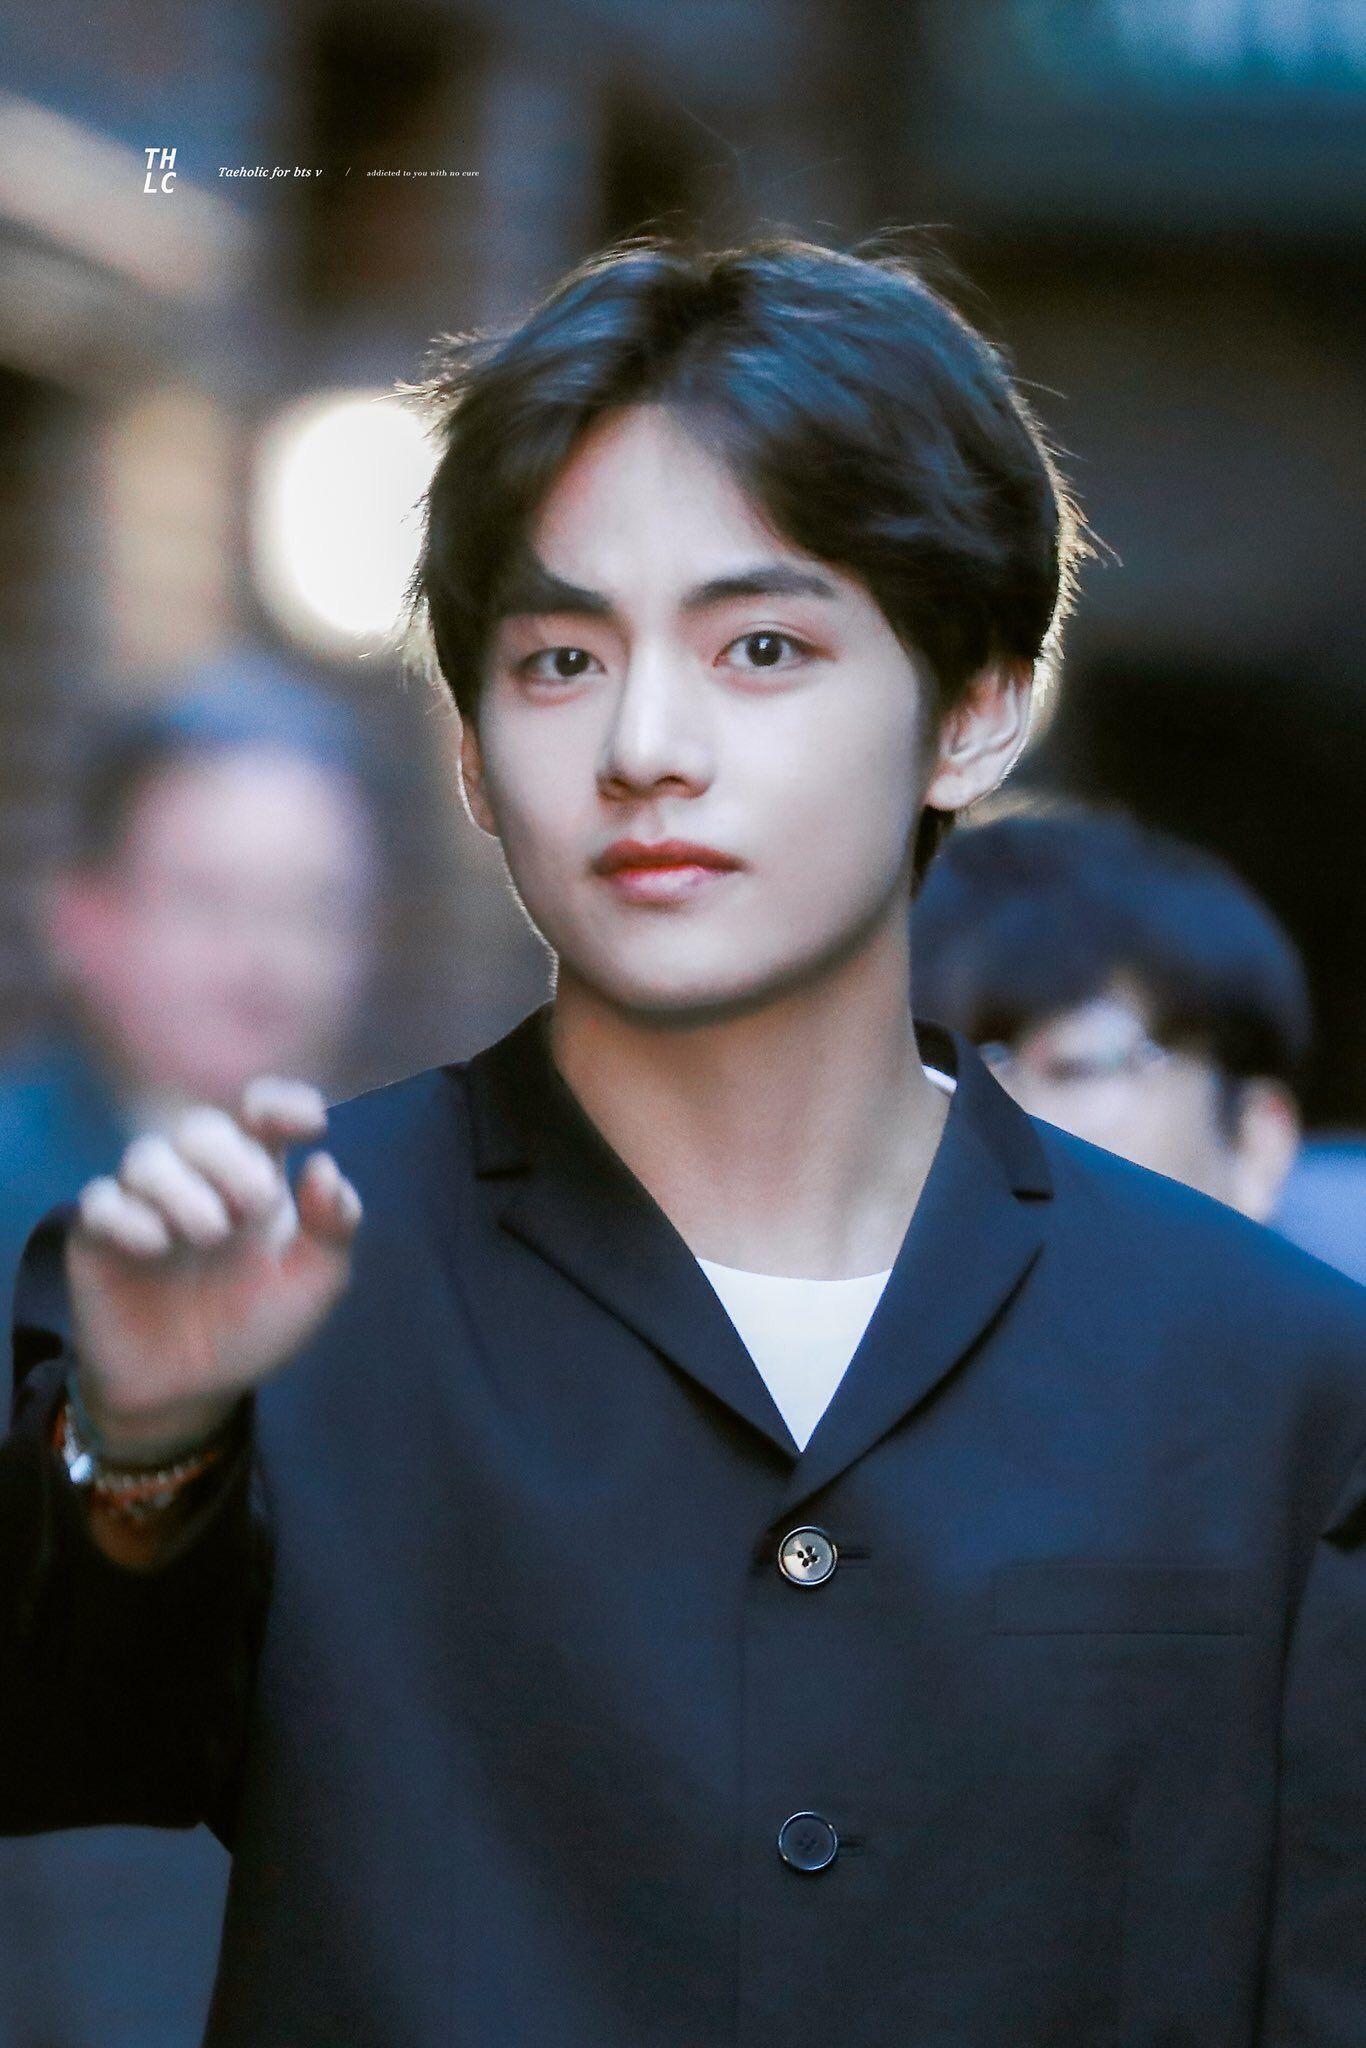 Jin Boyfriend Material